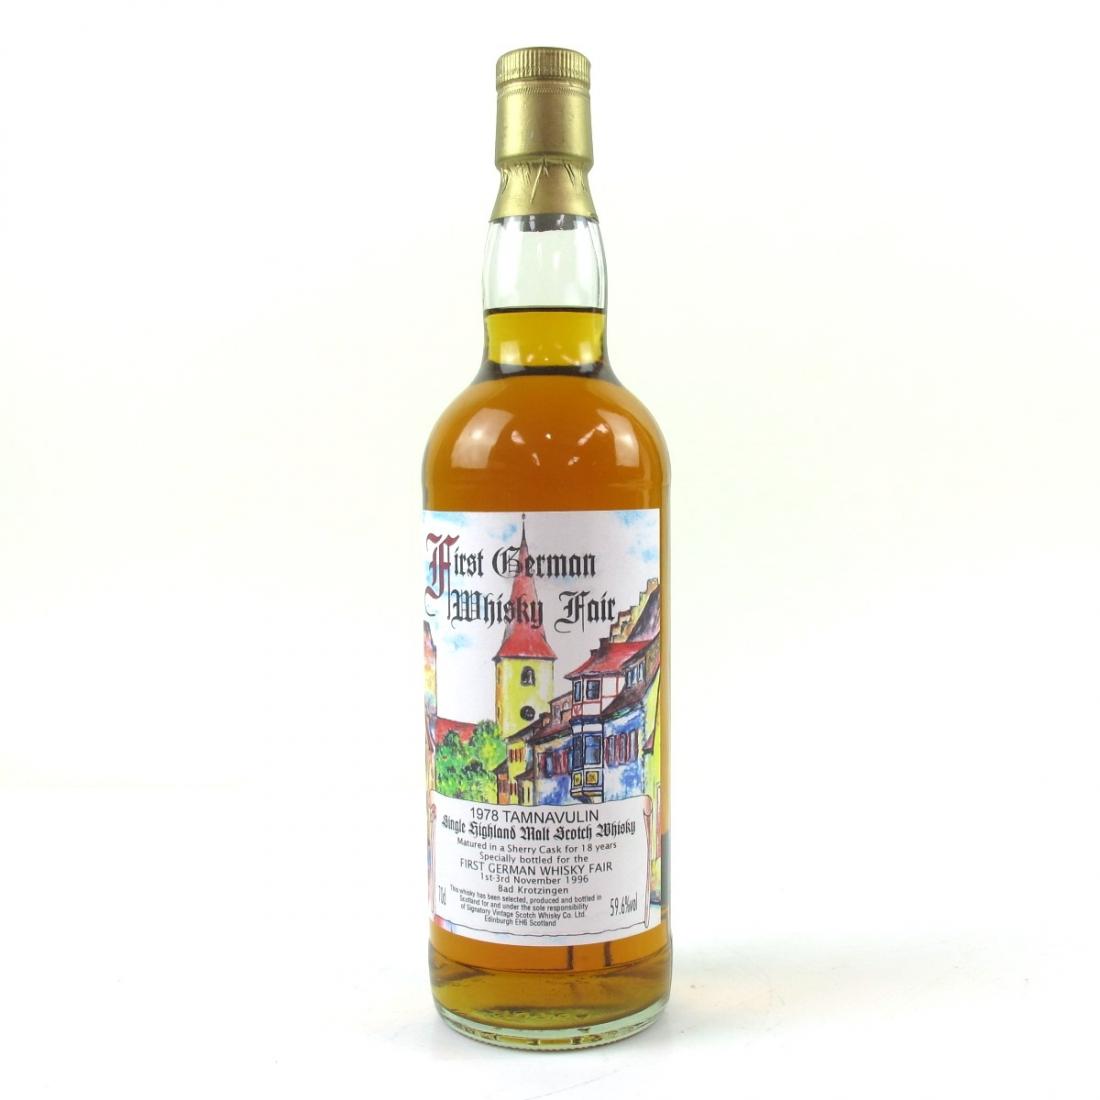 Tamnavulin 1978 Signatory Vintage 18 Year Old / First German Whisky Fair